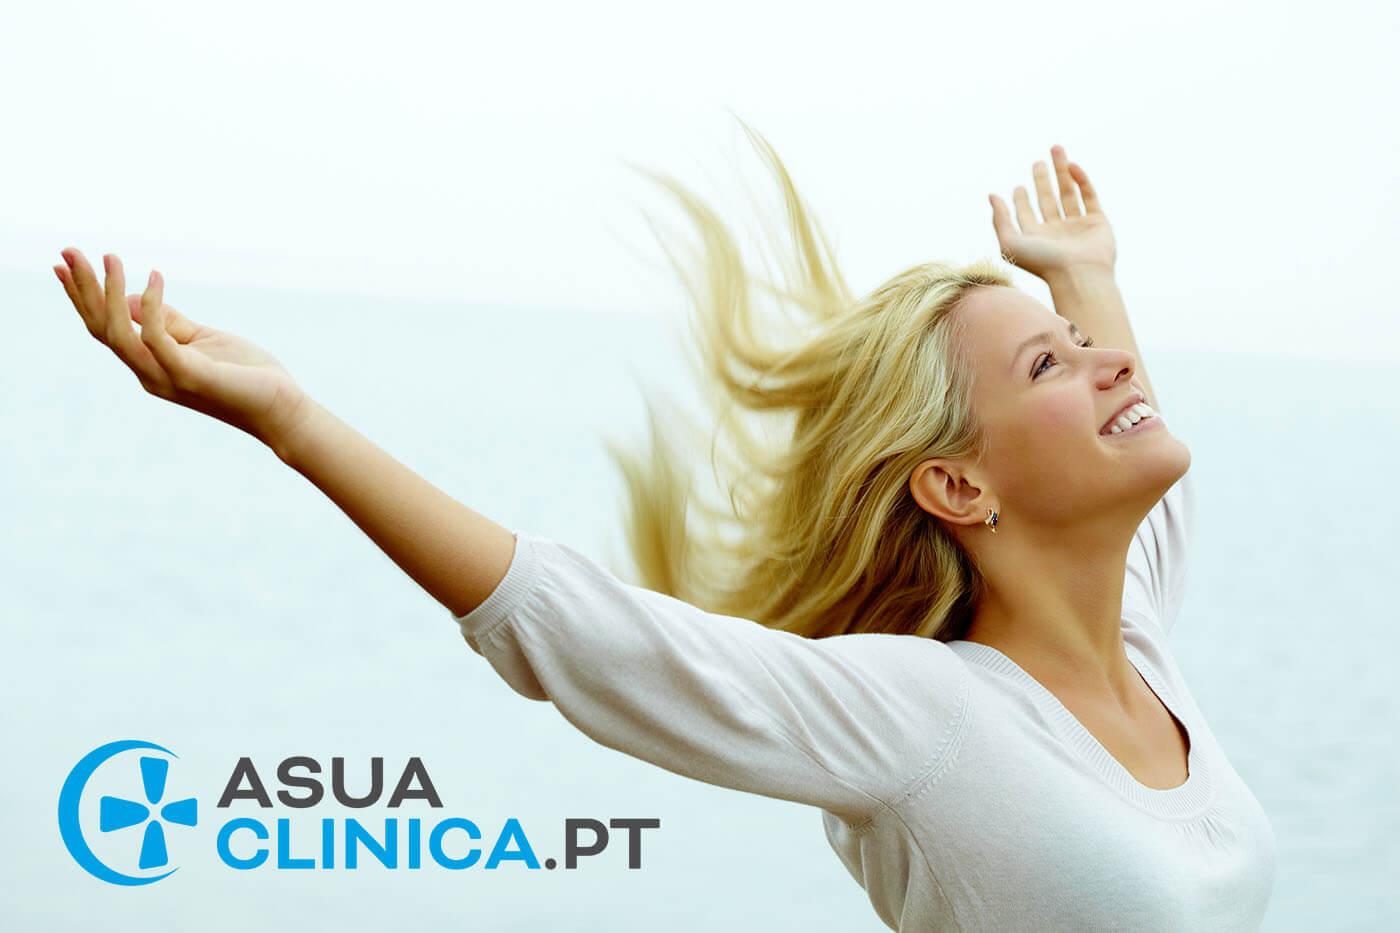 asuaclinica.pt estetiva feira in beauty